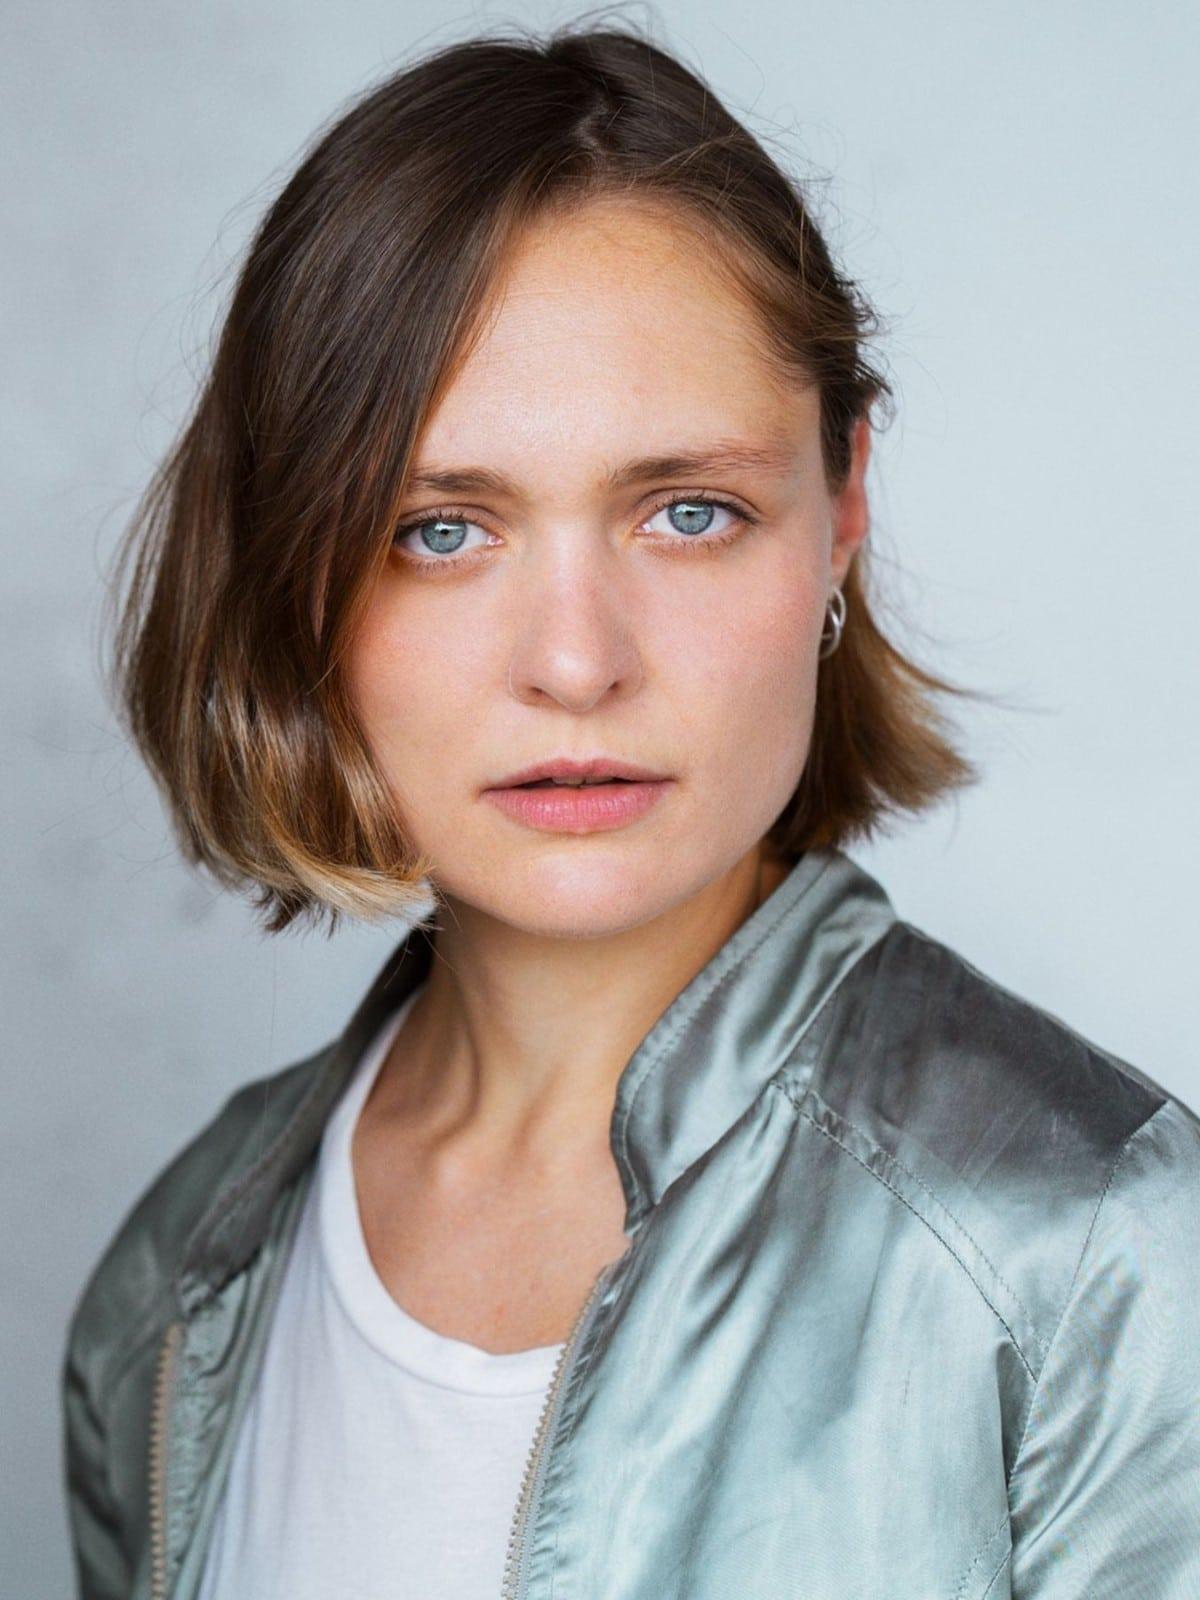 Johanna Meinhard, Actors Agency Osman, Schauspielagentur